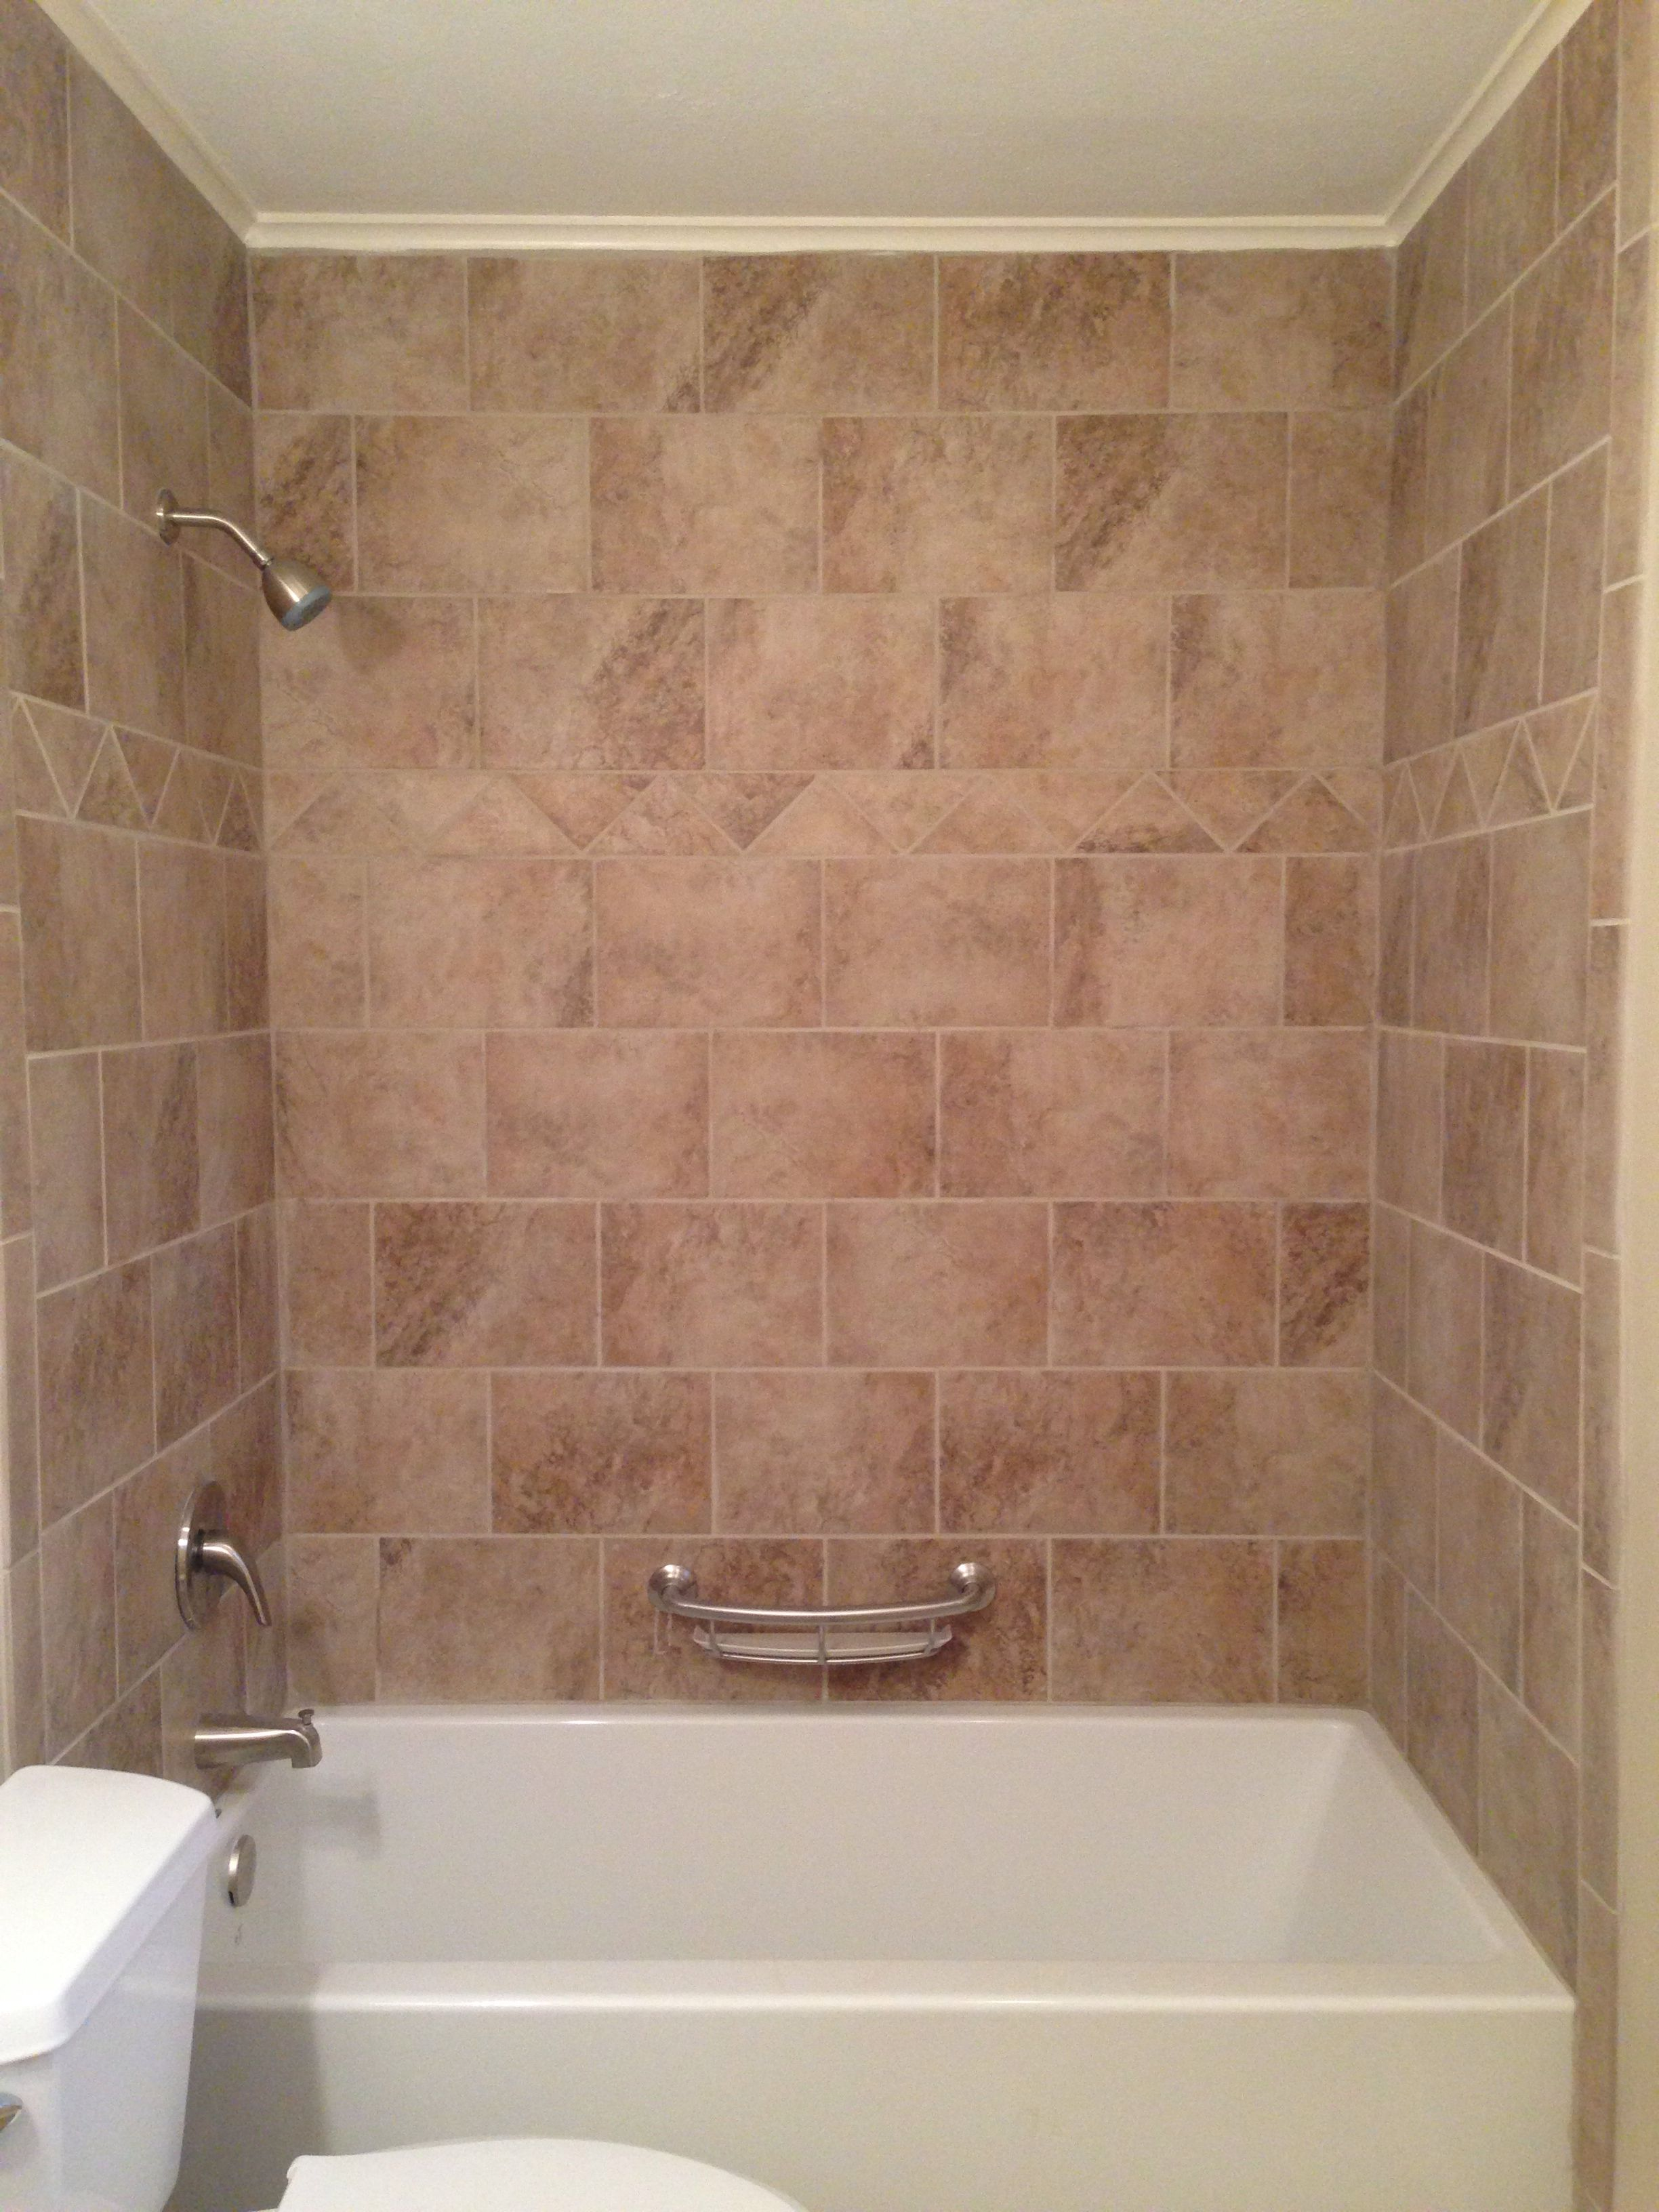 Tile surround bathtub. Beige tile around bathtub.